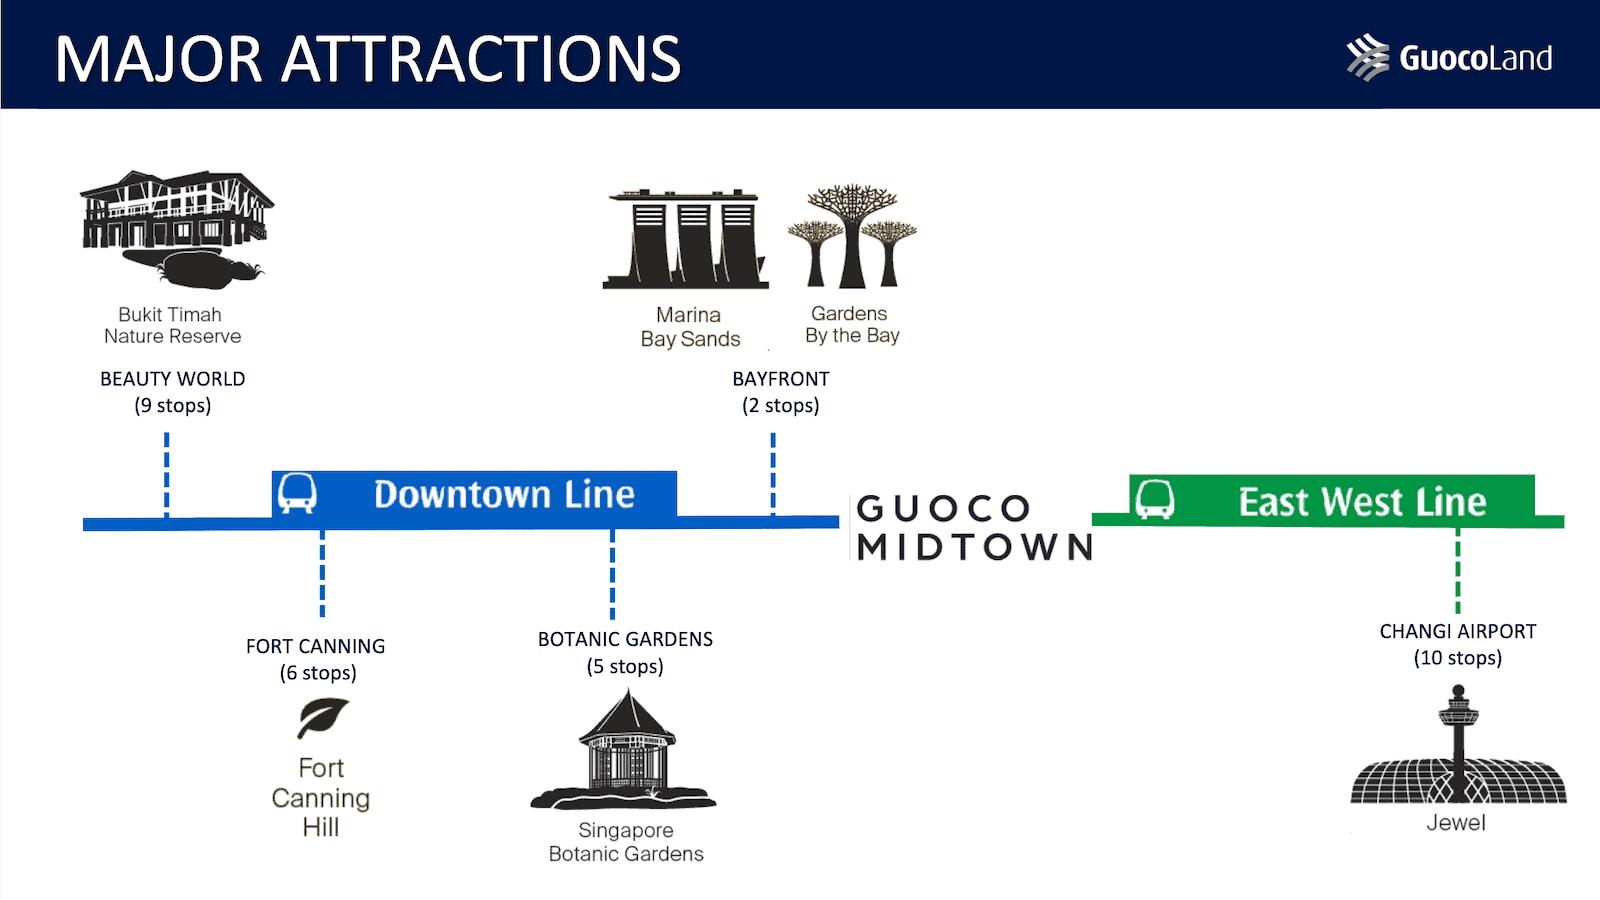 Midtown Modern Location Major Attractions